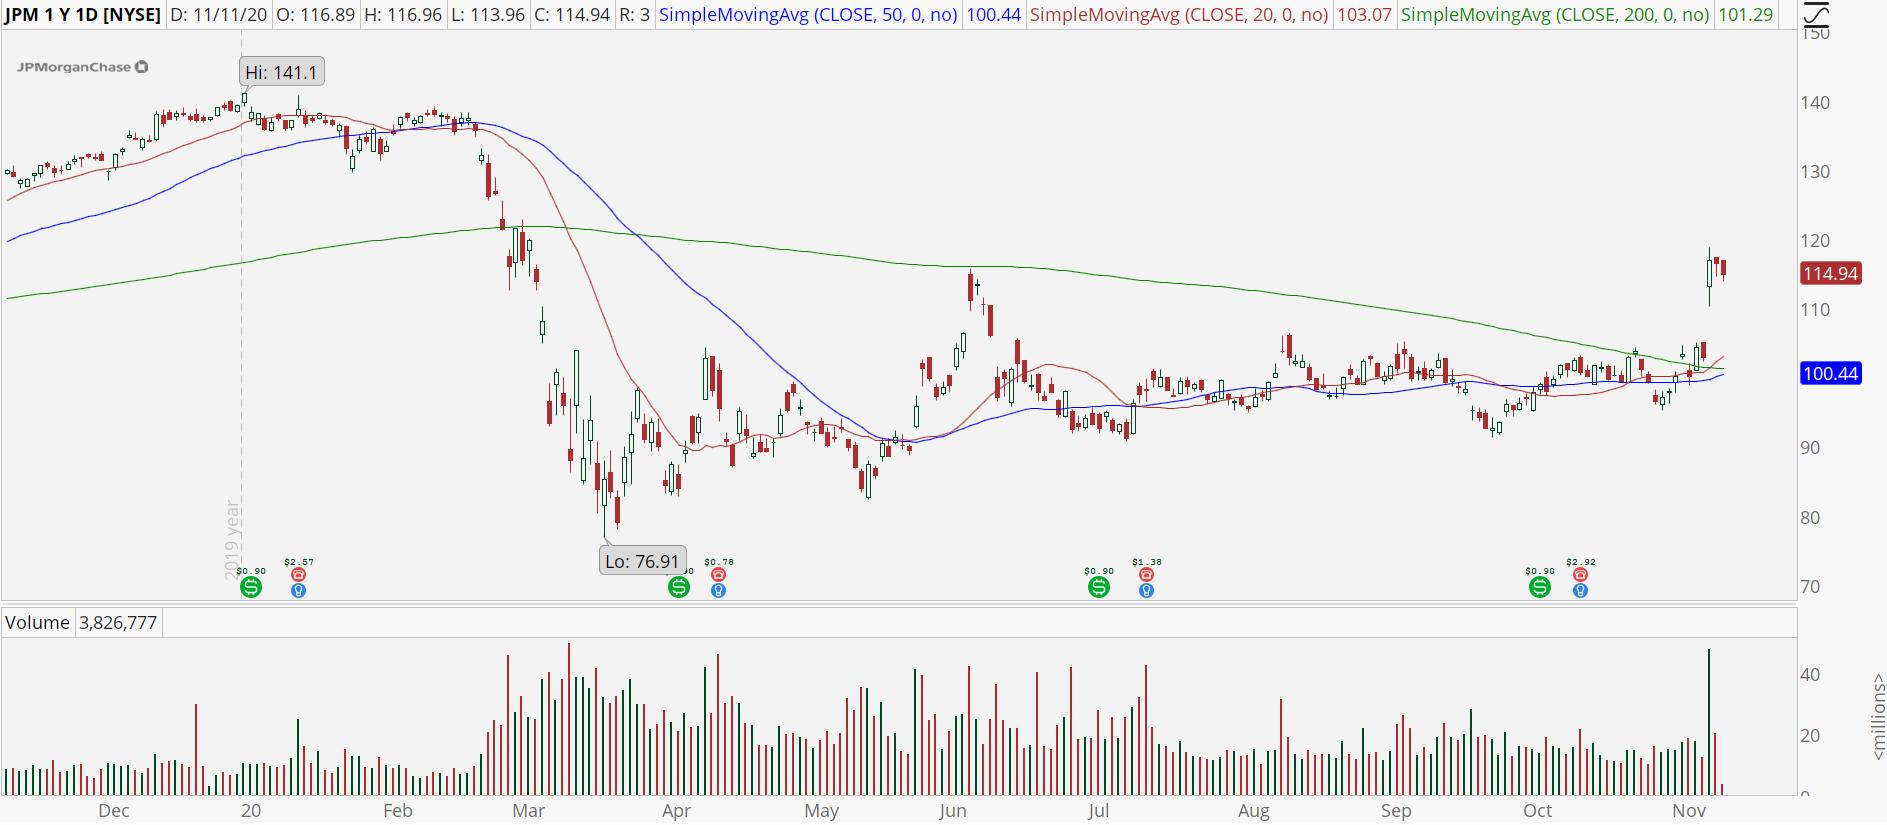 JPMorgan Chase (JPM) stock chart with bull breakout